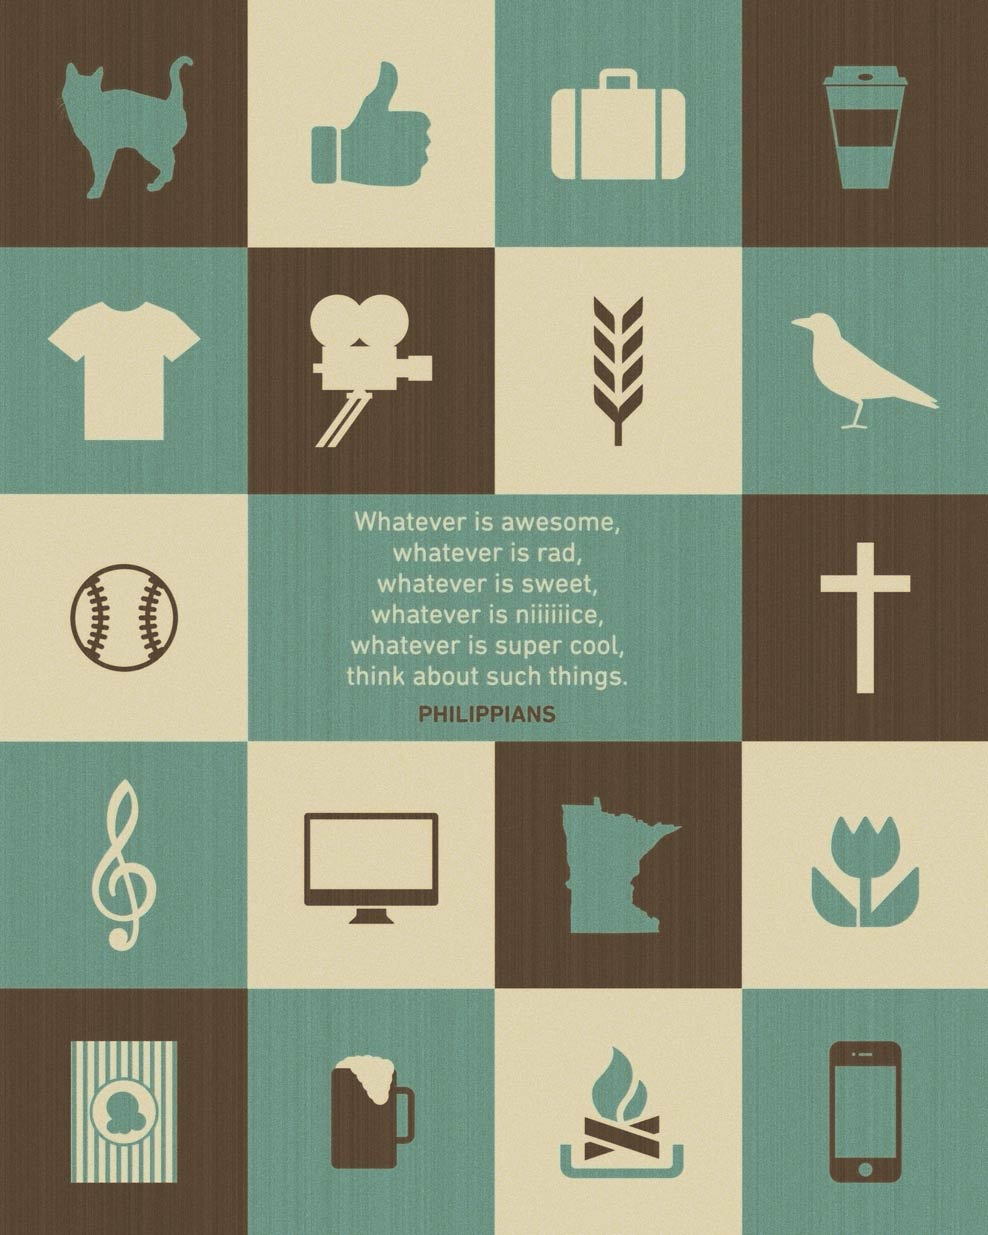 50-Philippians_Jim-LePage.jpg